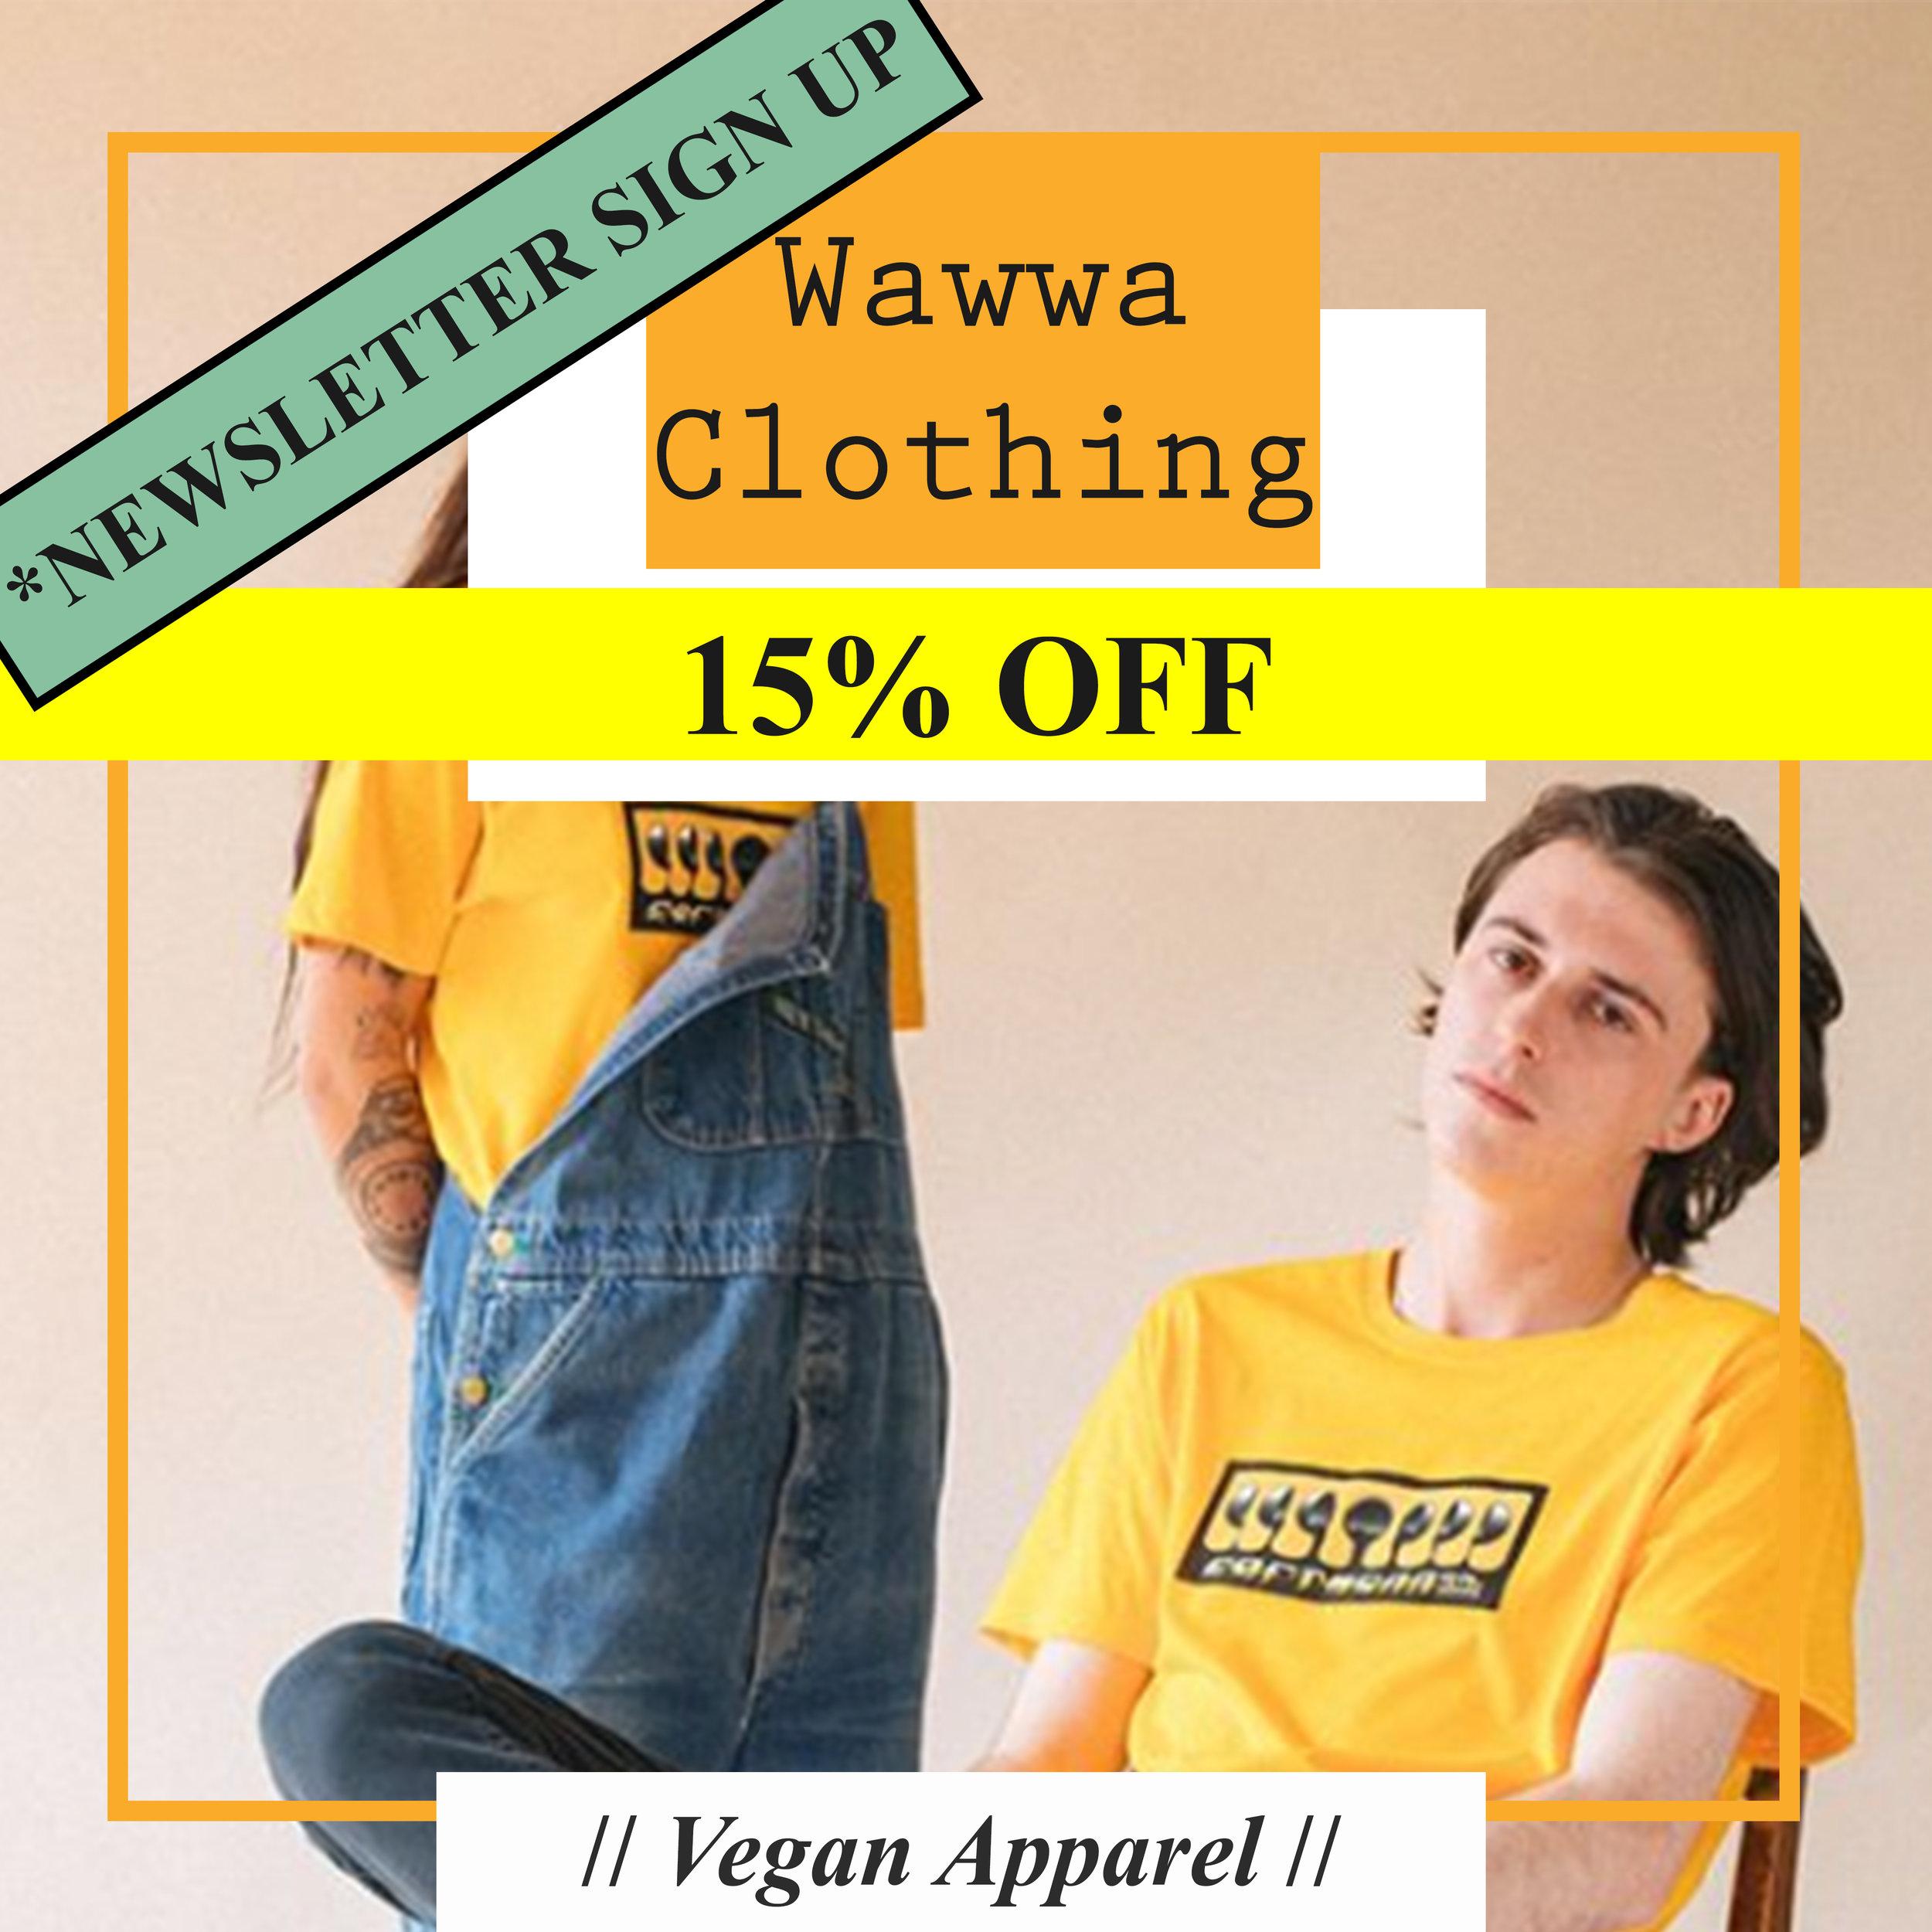 Wawwa Clothing.jpg